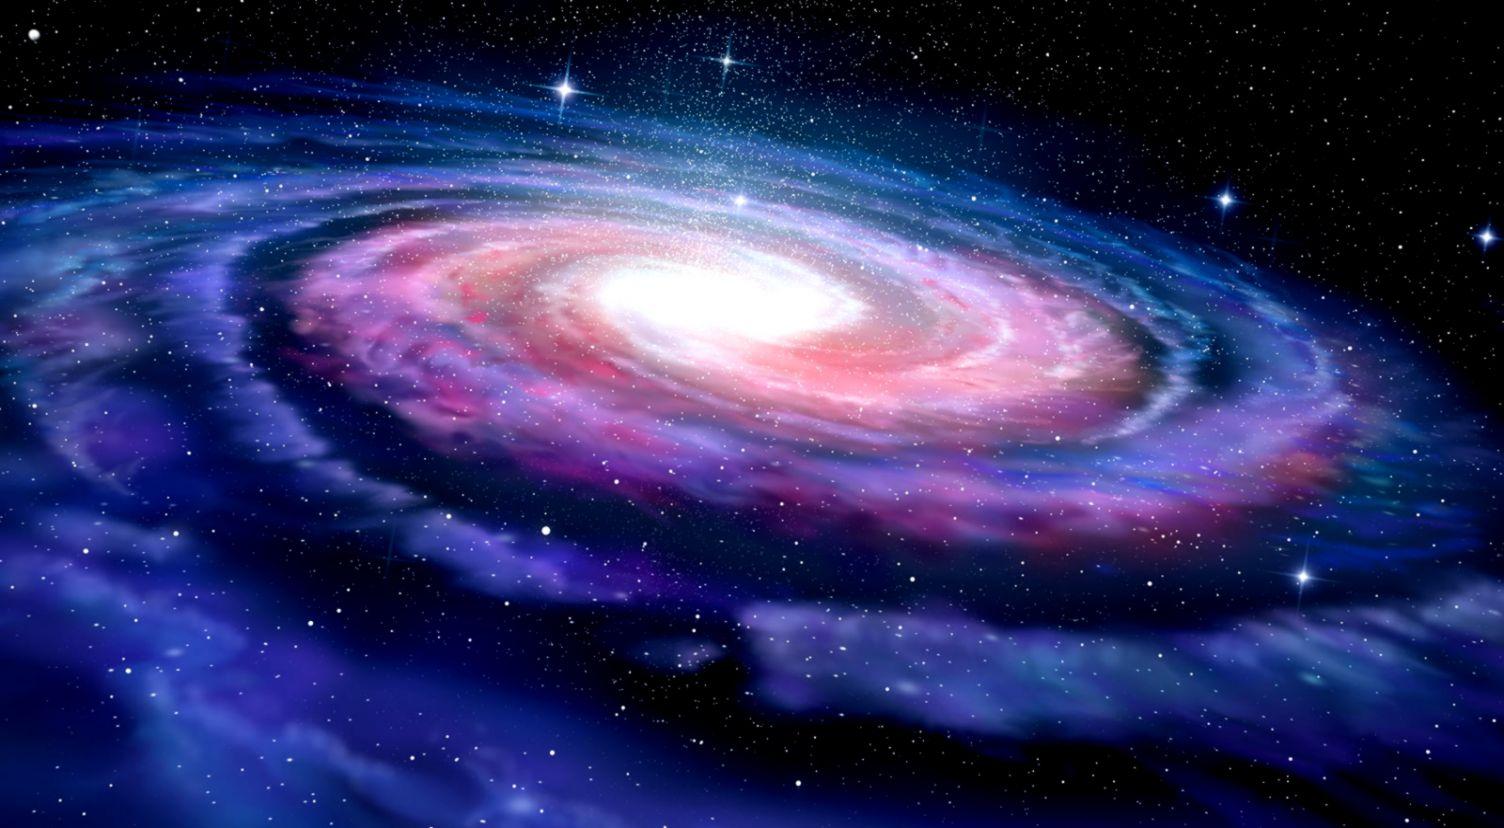 Space Supernova Sea Milky Way Hd Wallpaper Wallpapers Memes